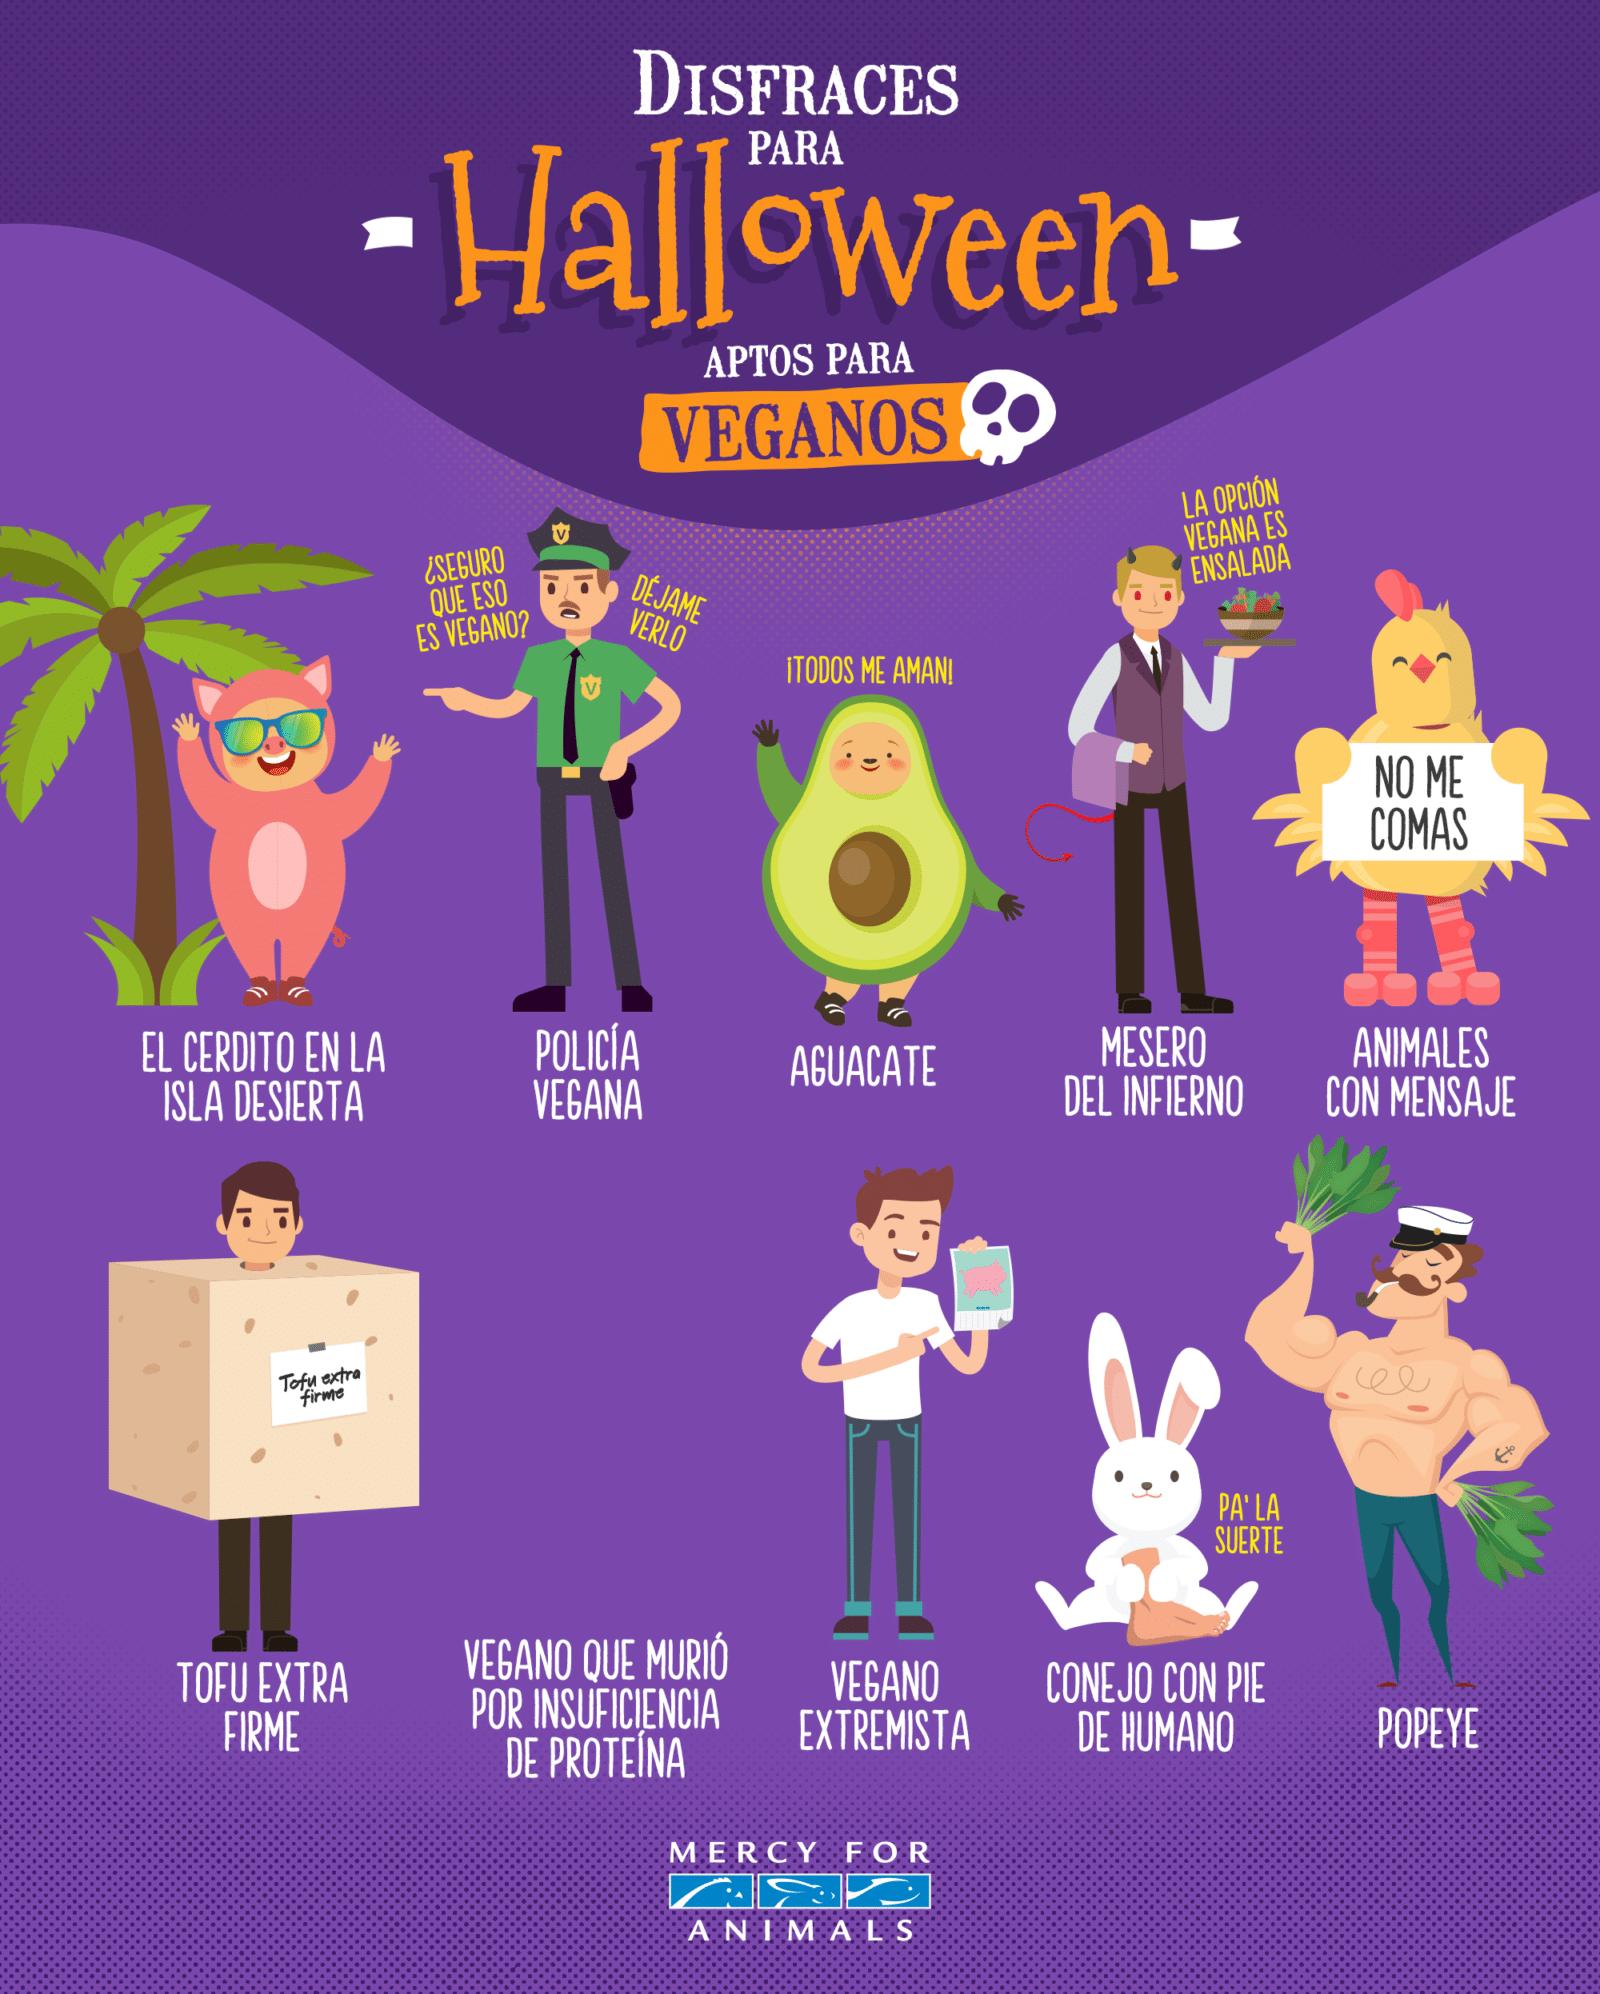 Disfraces para Halloween aptos para veganos